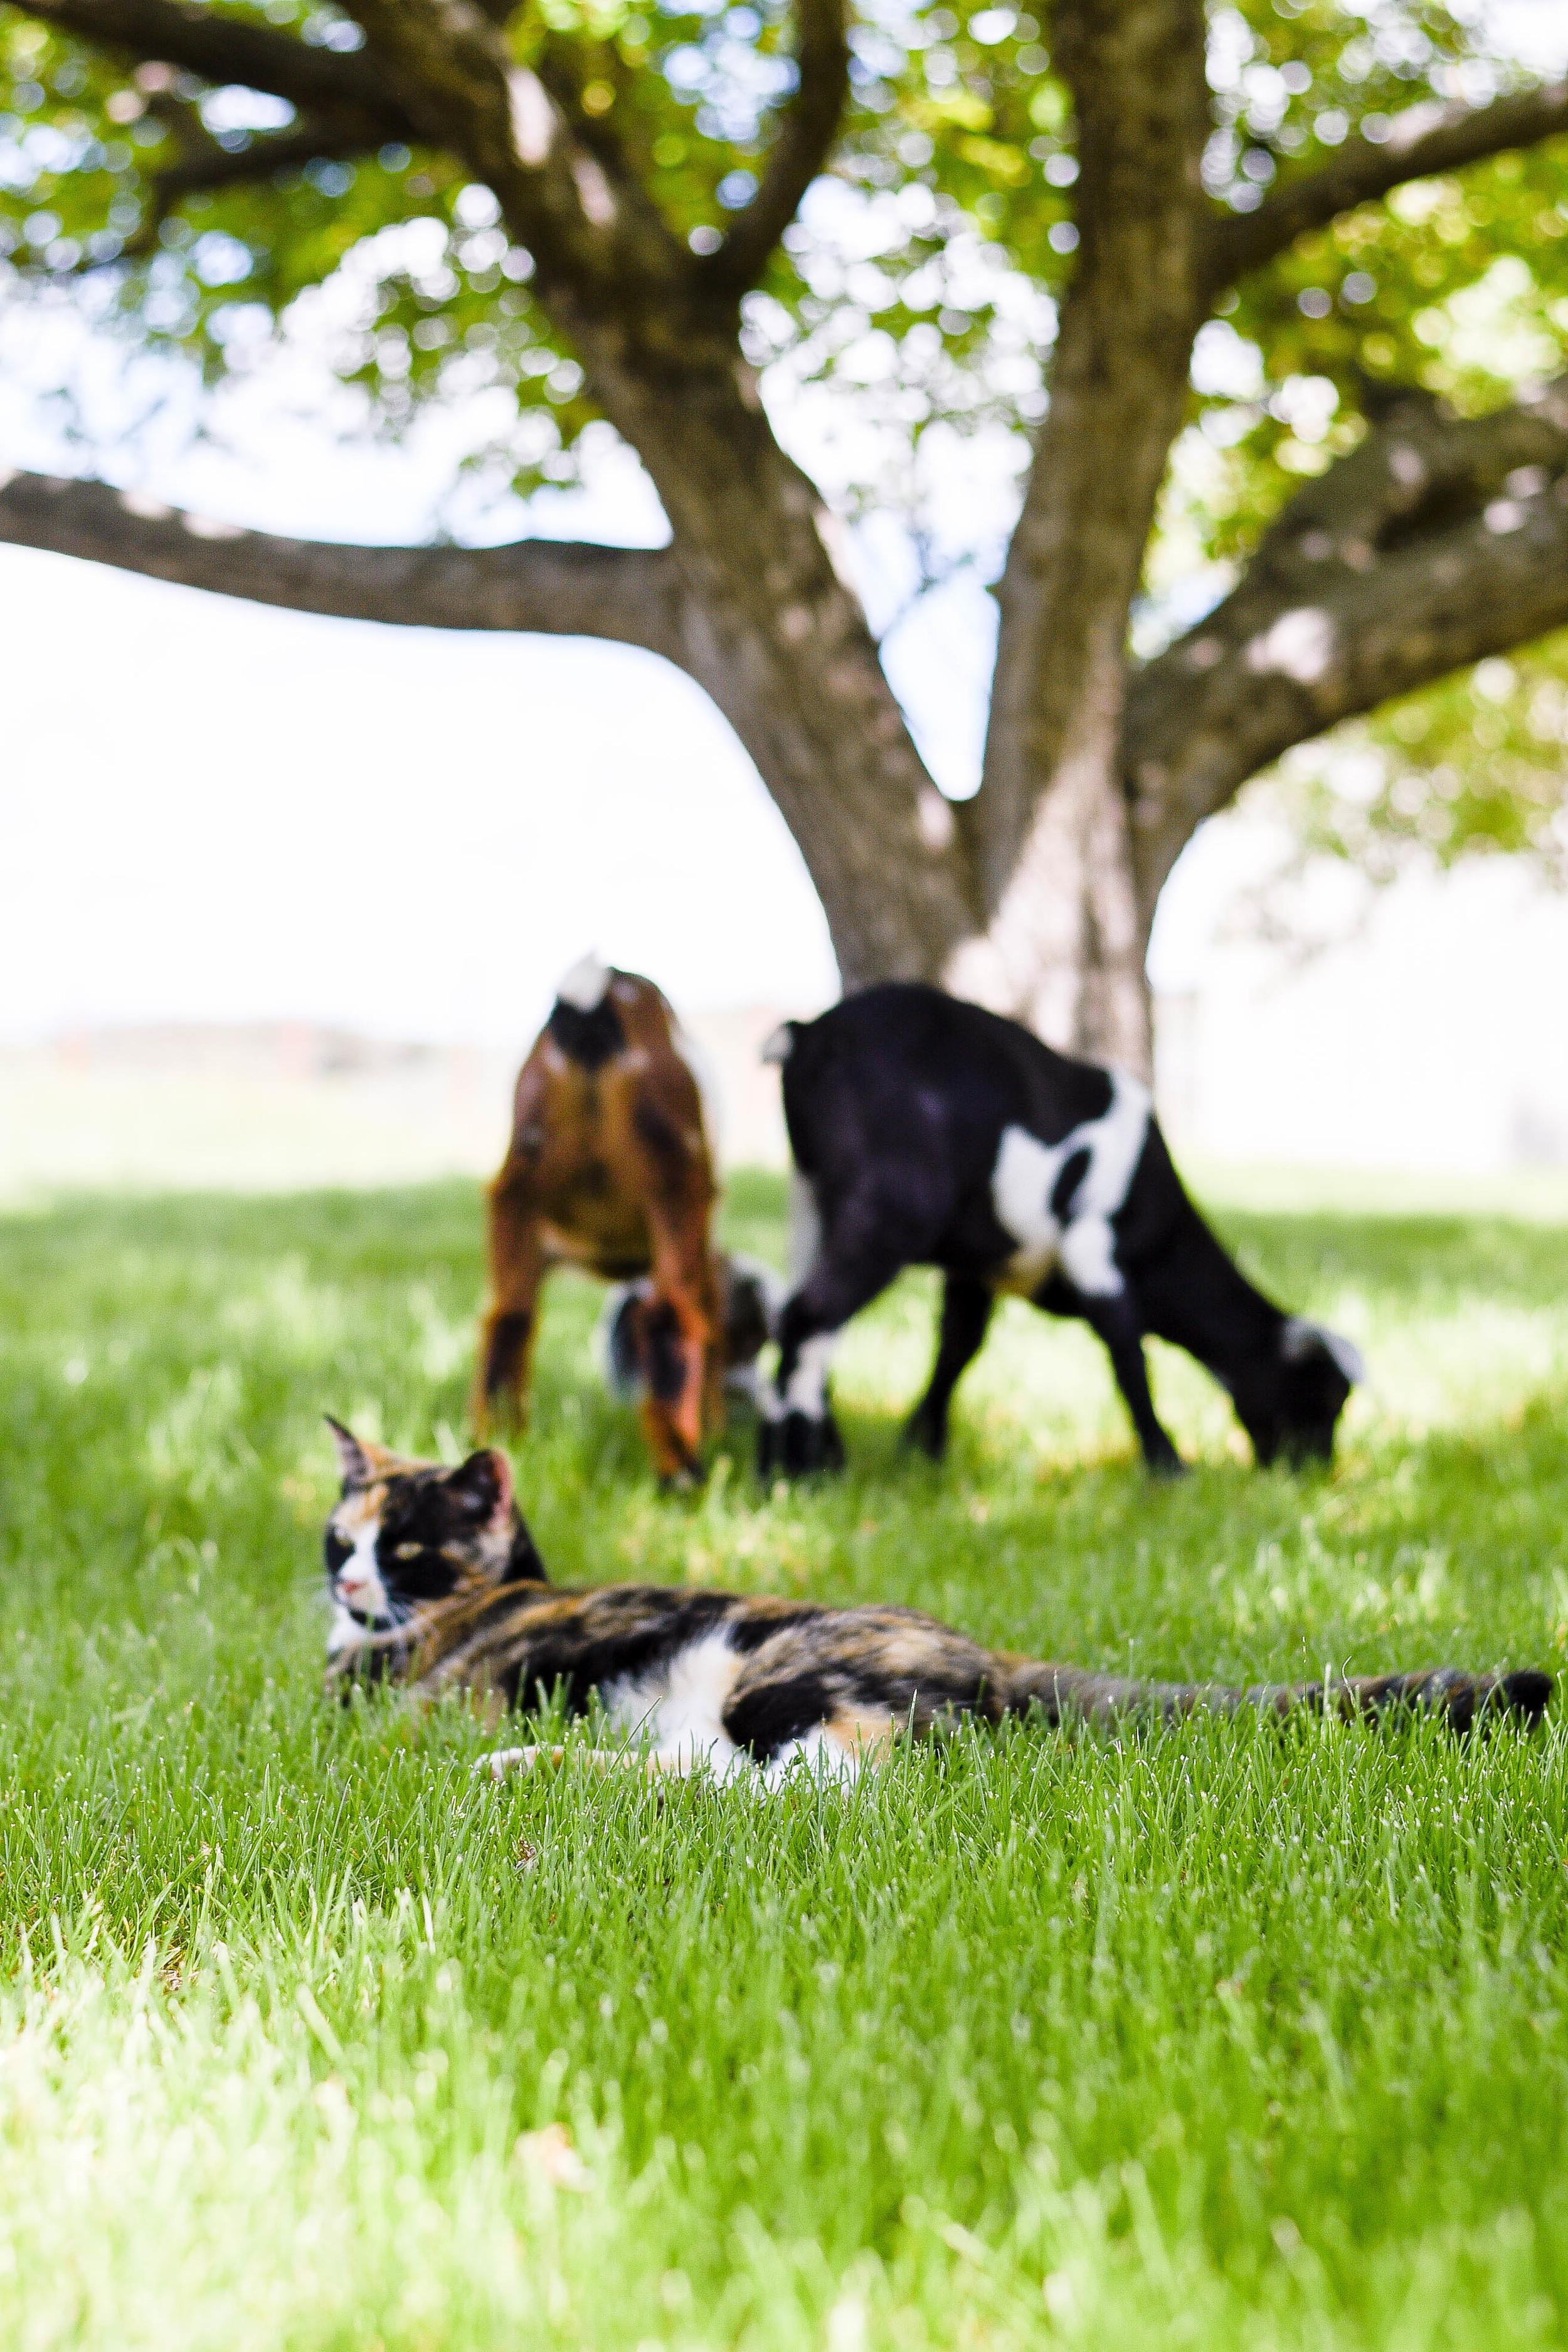 Baby Nubian goats & calico kitten   boxwoodavenue.com